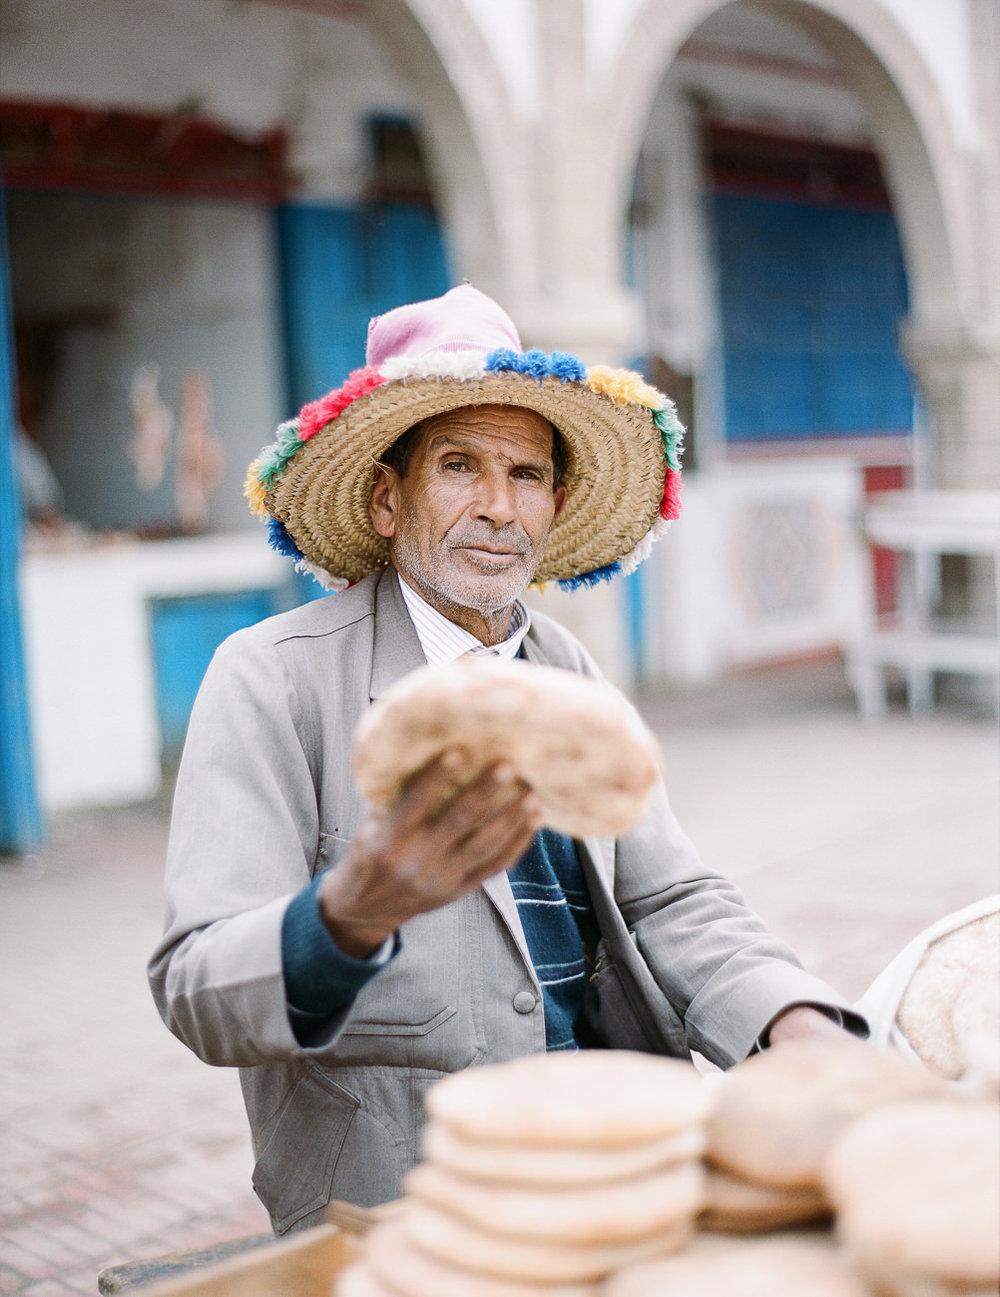 marrakech-photographe-voyage-alain-m-7.jpg